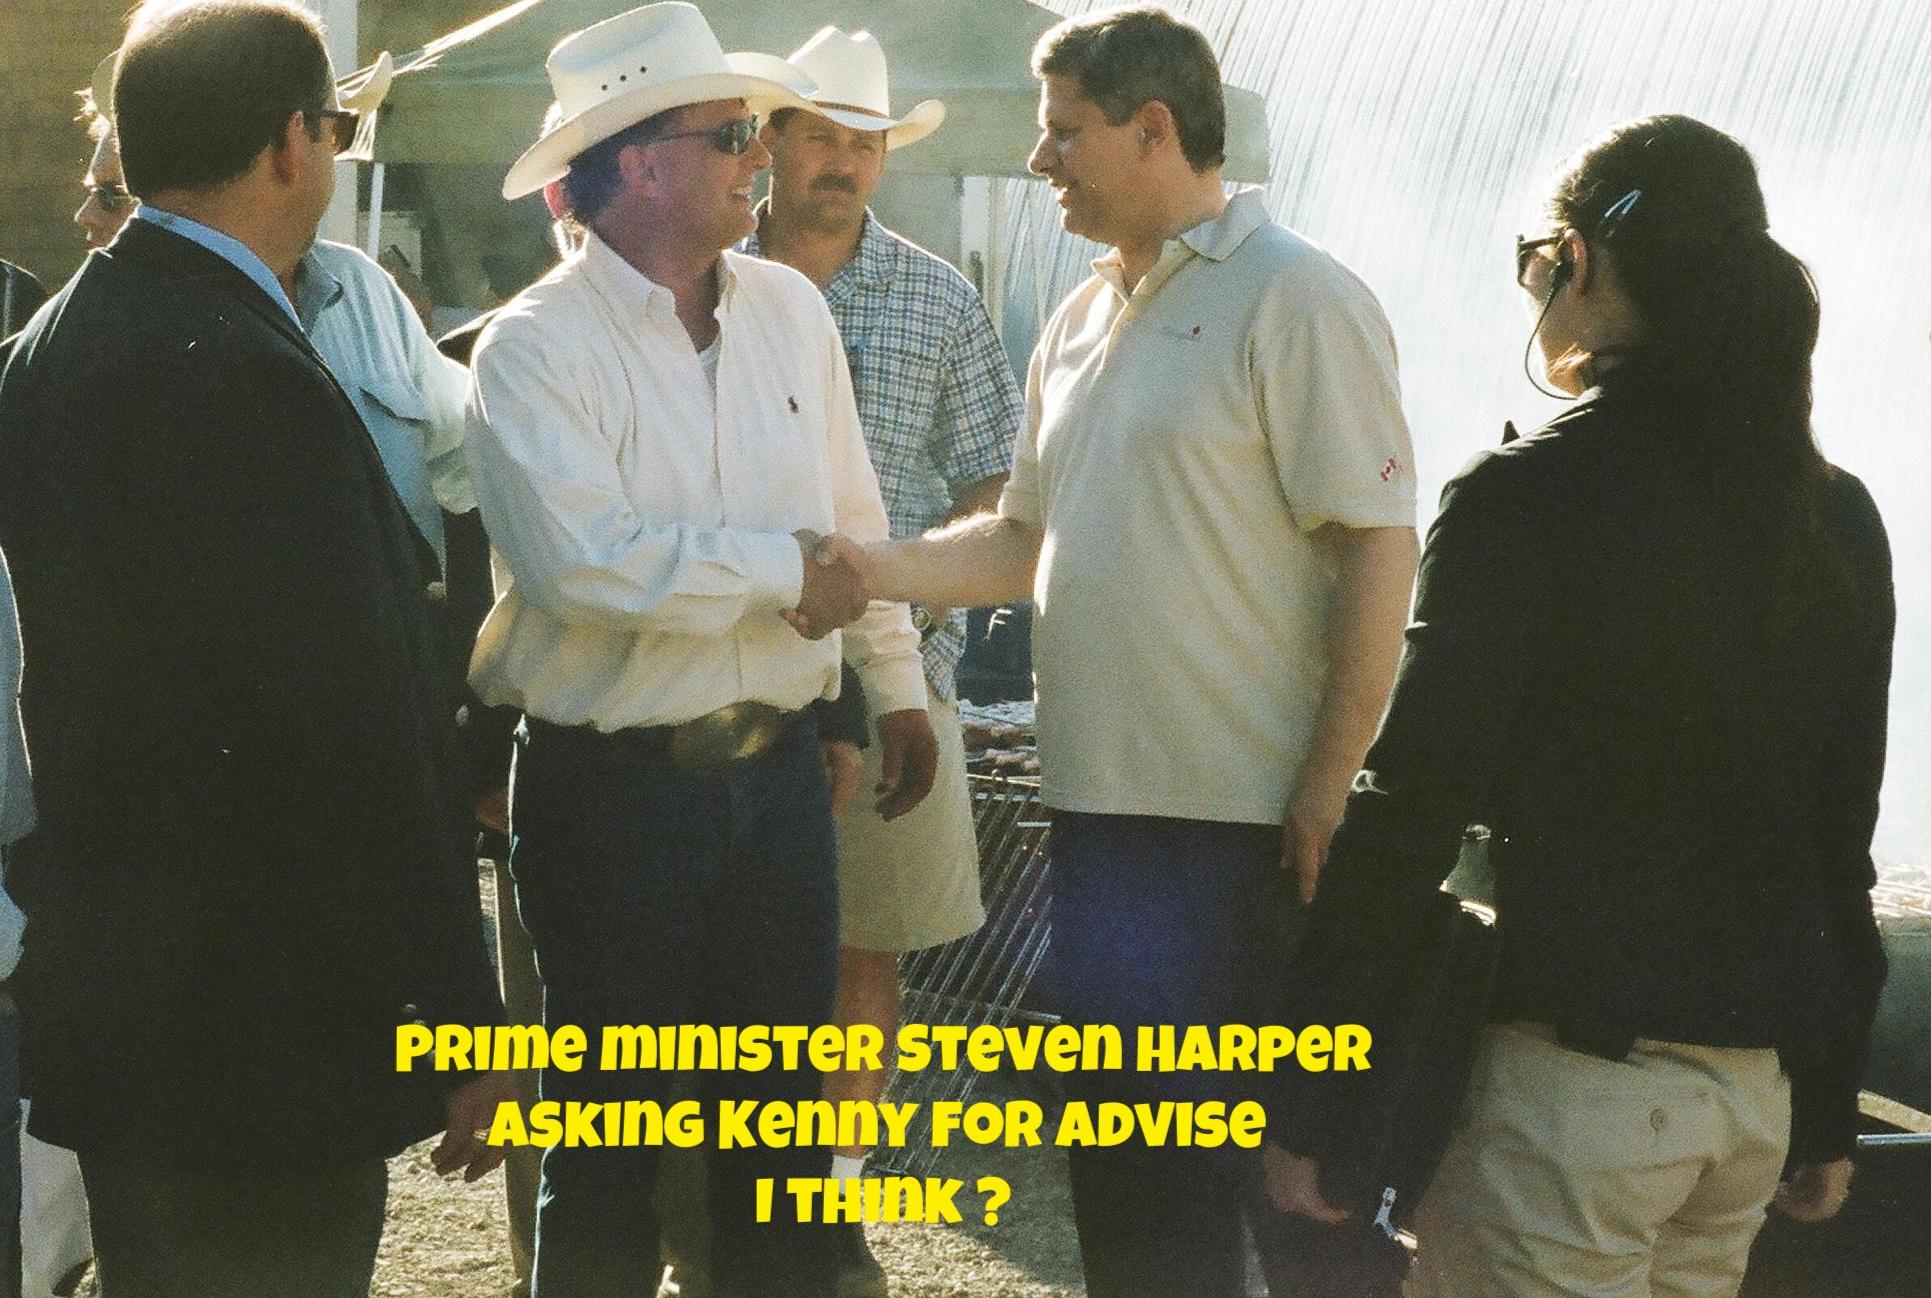 Kenny with Prime minister Steven Harper